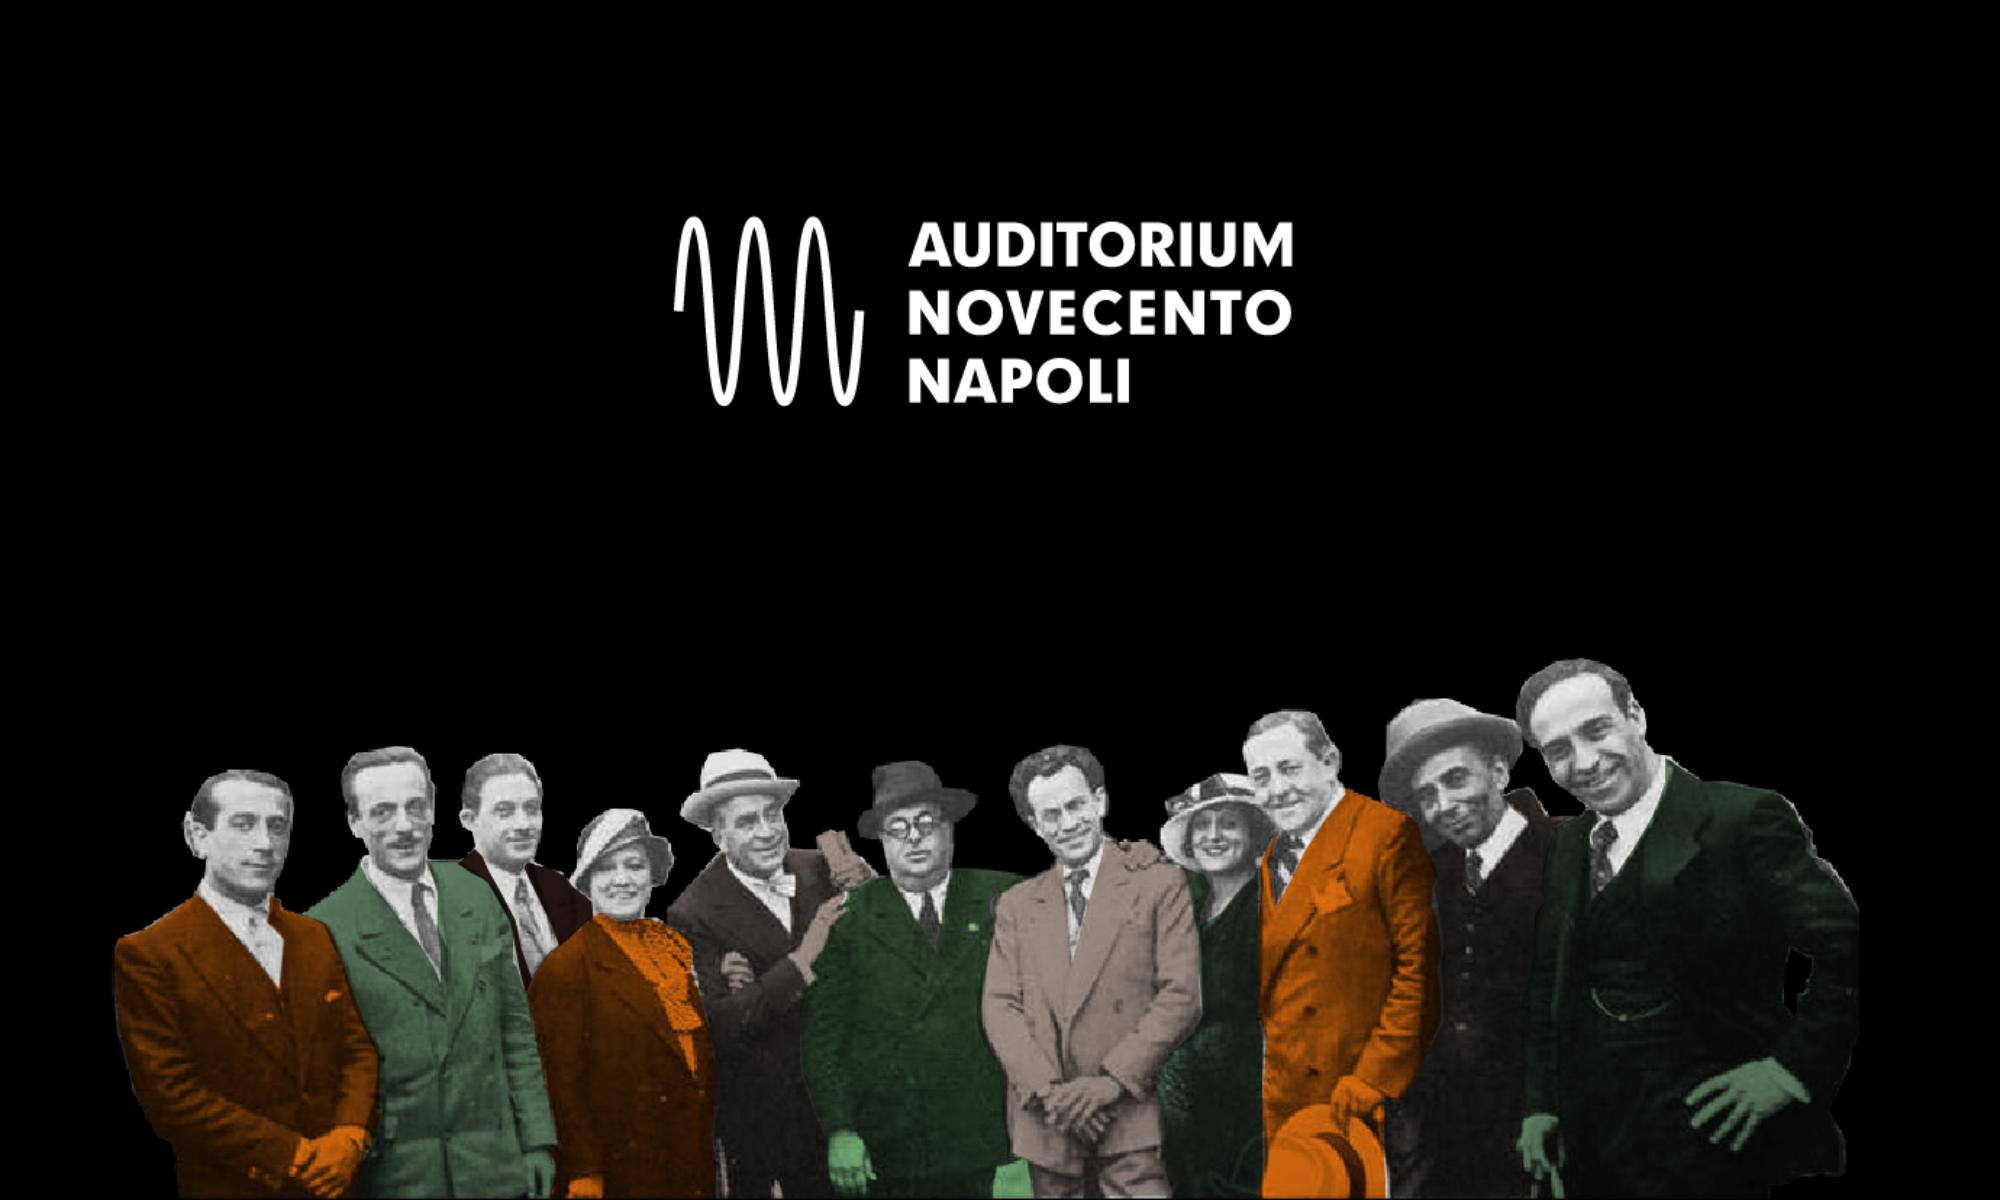 Auditorium Novecento Napoli